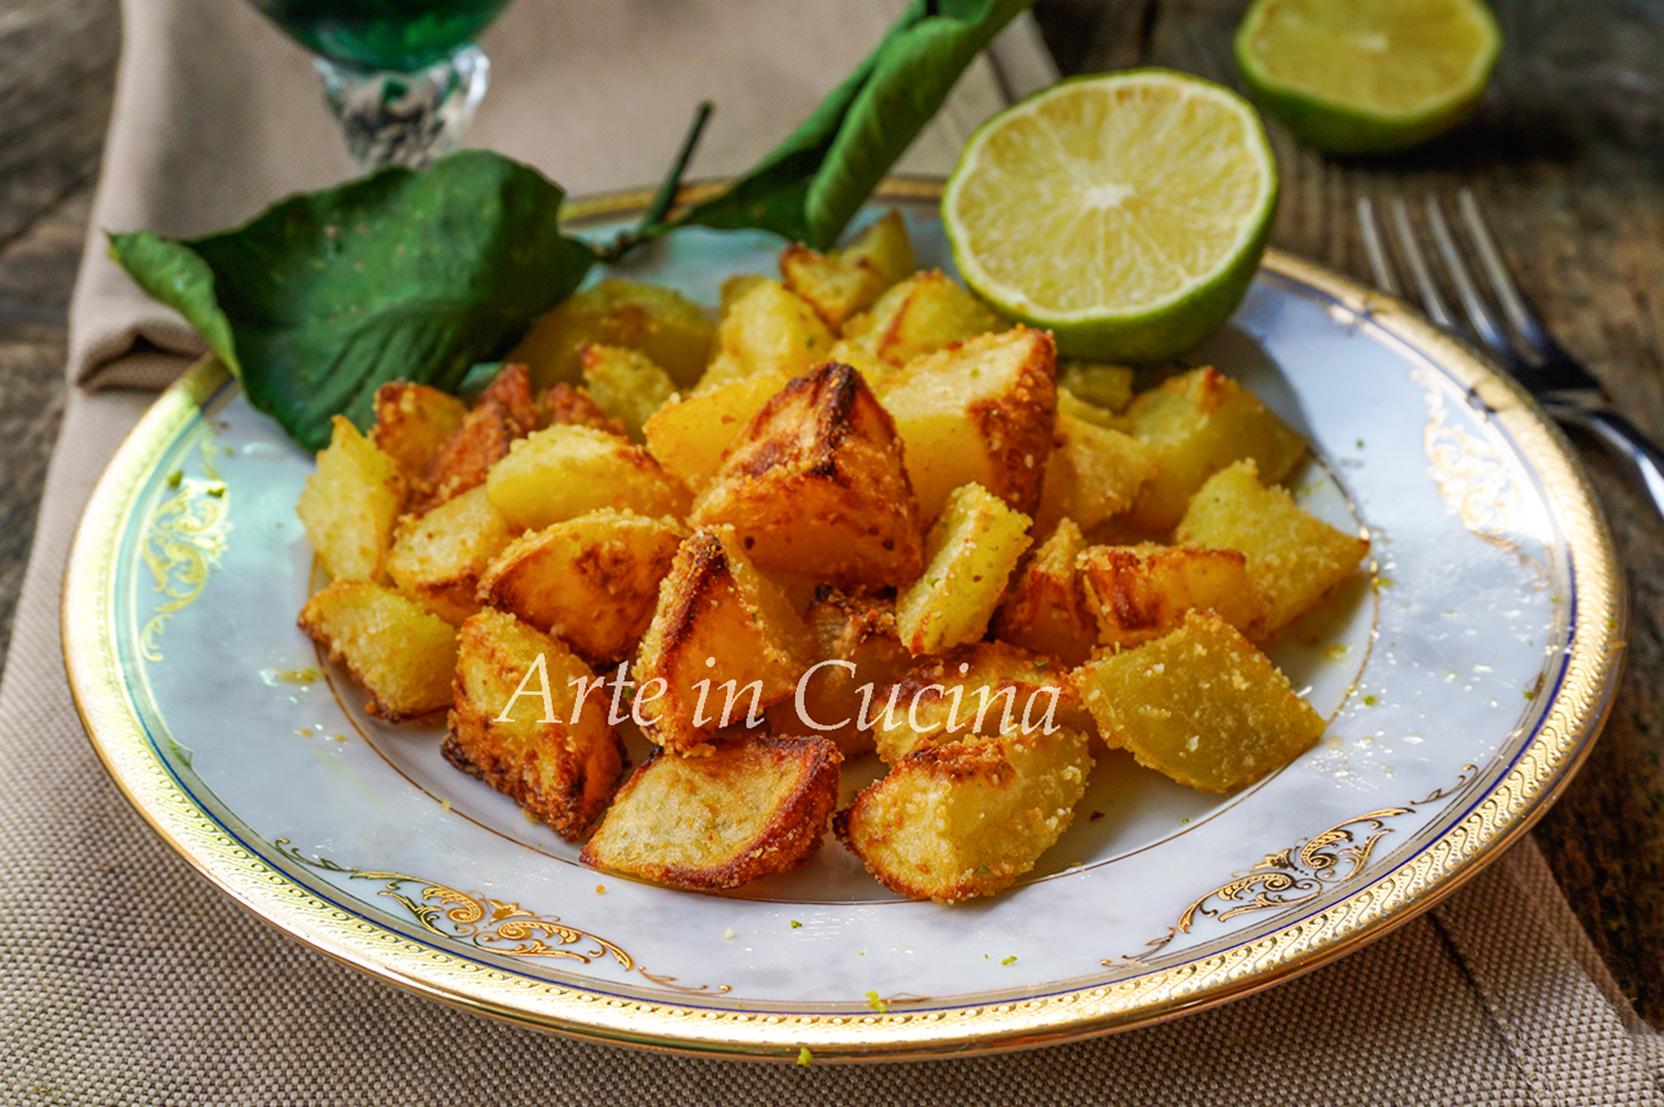 Patate croccanti al lime ricetta facile vickyart arte in cucina